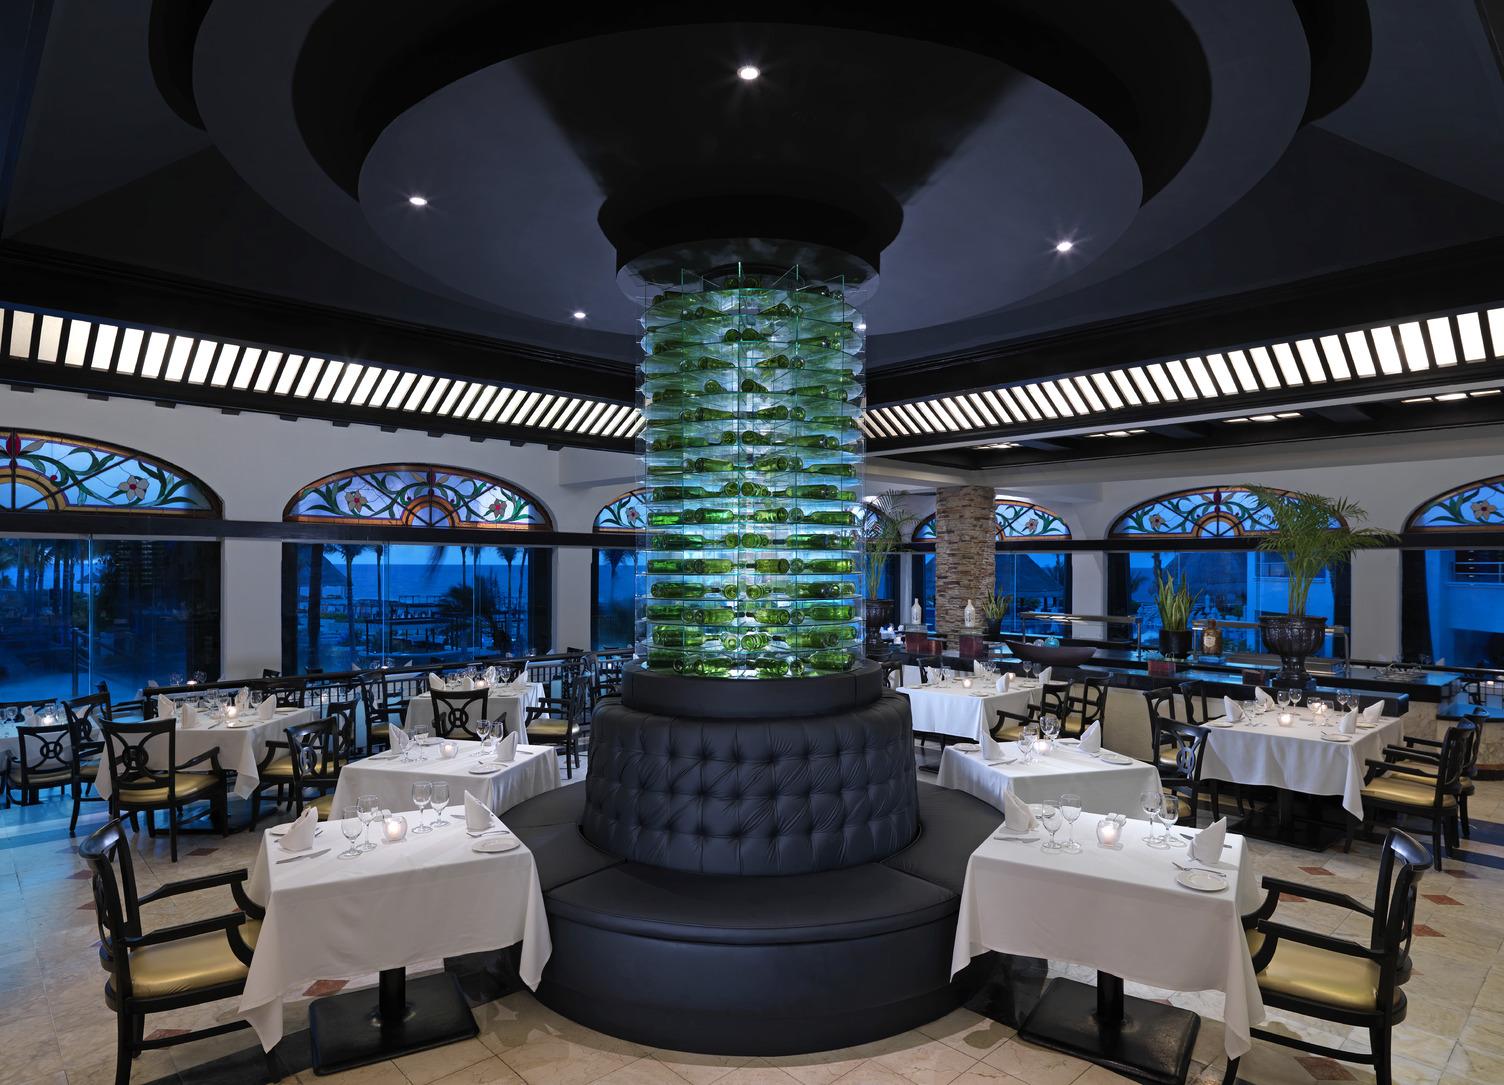 Travel Agency All-Inclusive Resort Heaven at Hard Rock Hotel Riviera Maya 42